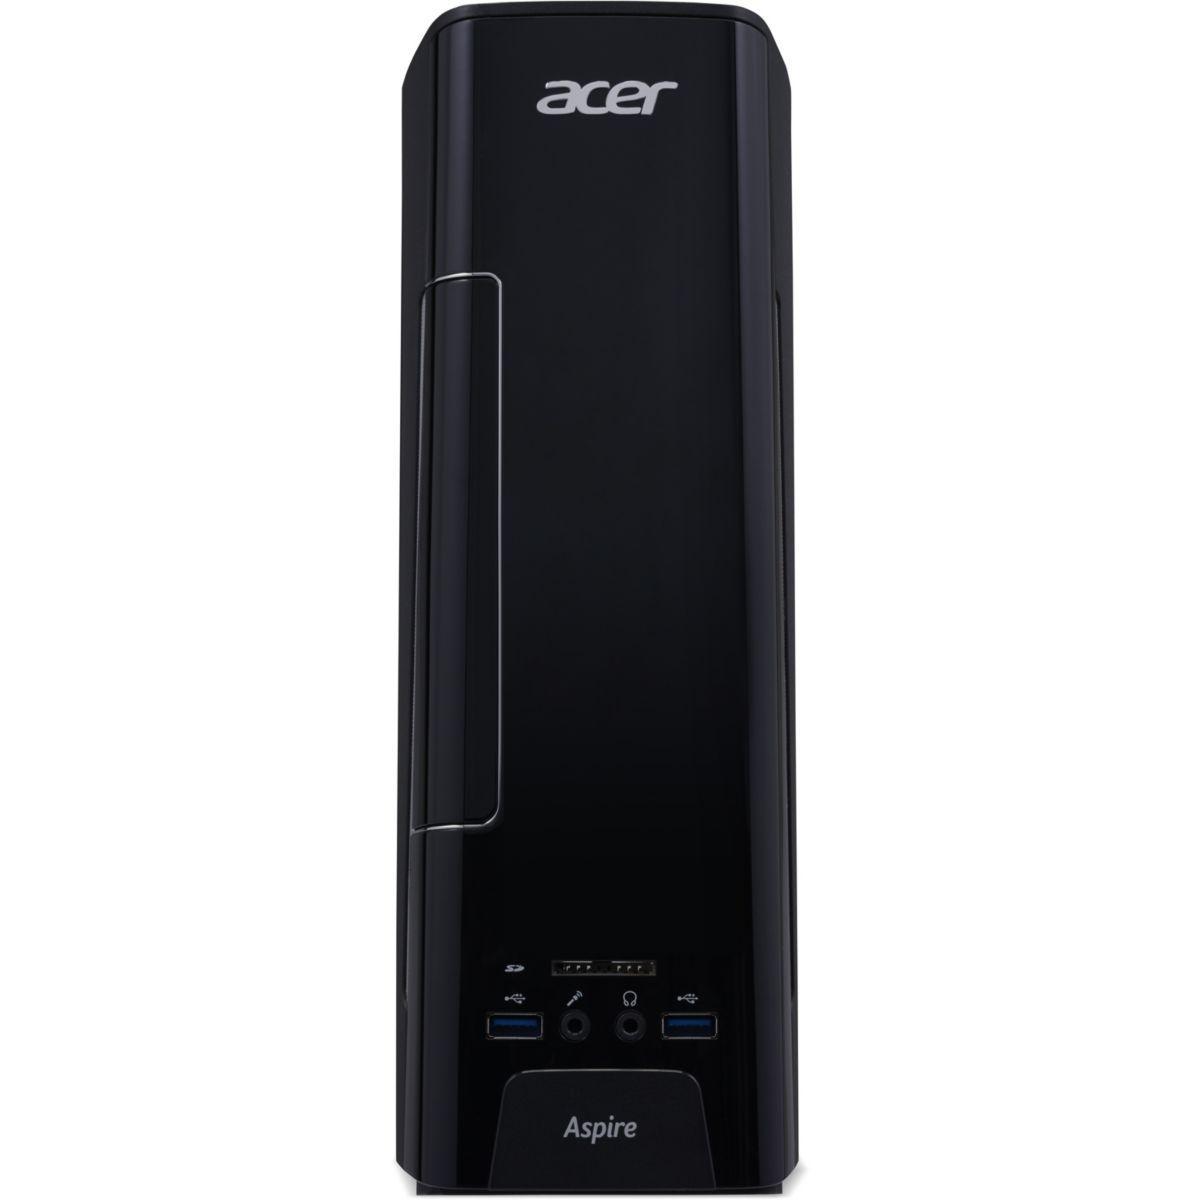 Ordi ACER Aspire AXC-780 (photo)